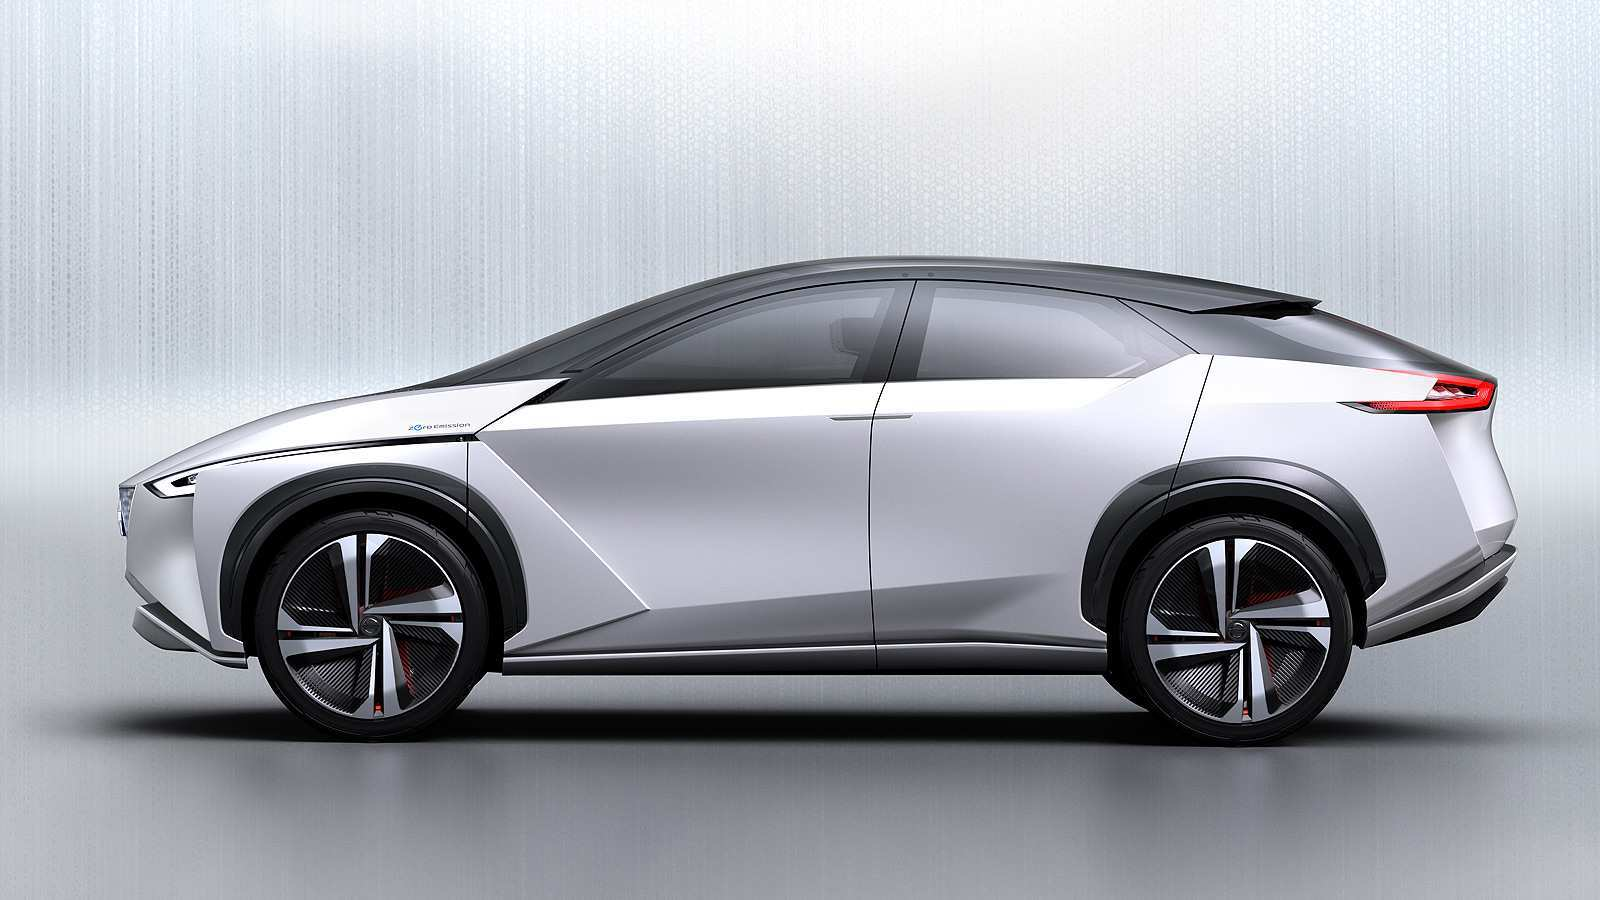 37 Best Review Lanzamientos Nissan 2020 Reviews for Lanzamientos Nissan 2020